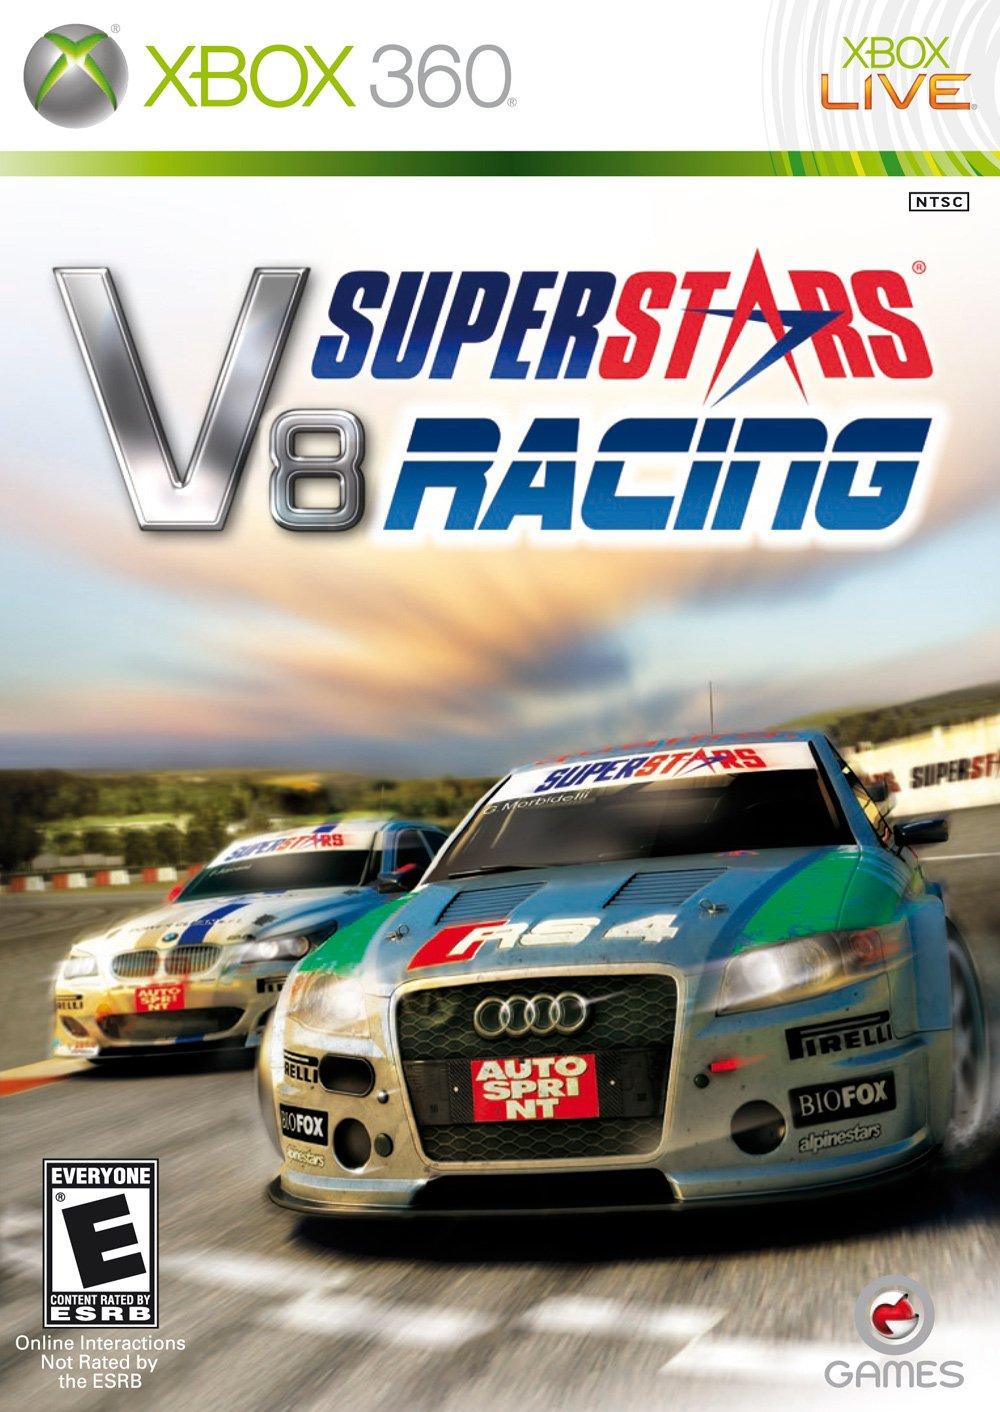 Racing Games For Xbox 360 : Superstars v racing xbox скачать игру на